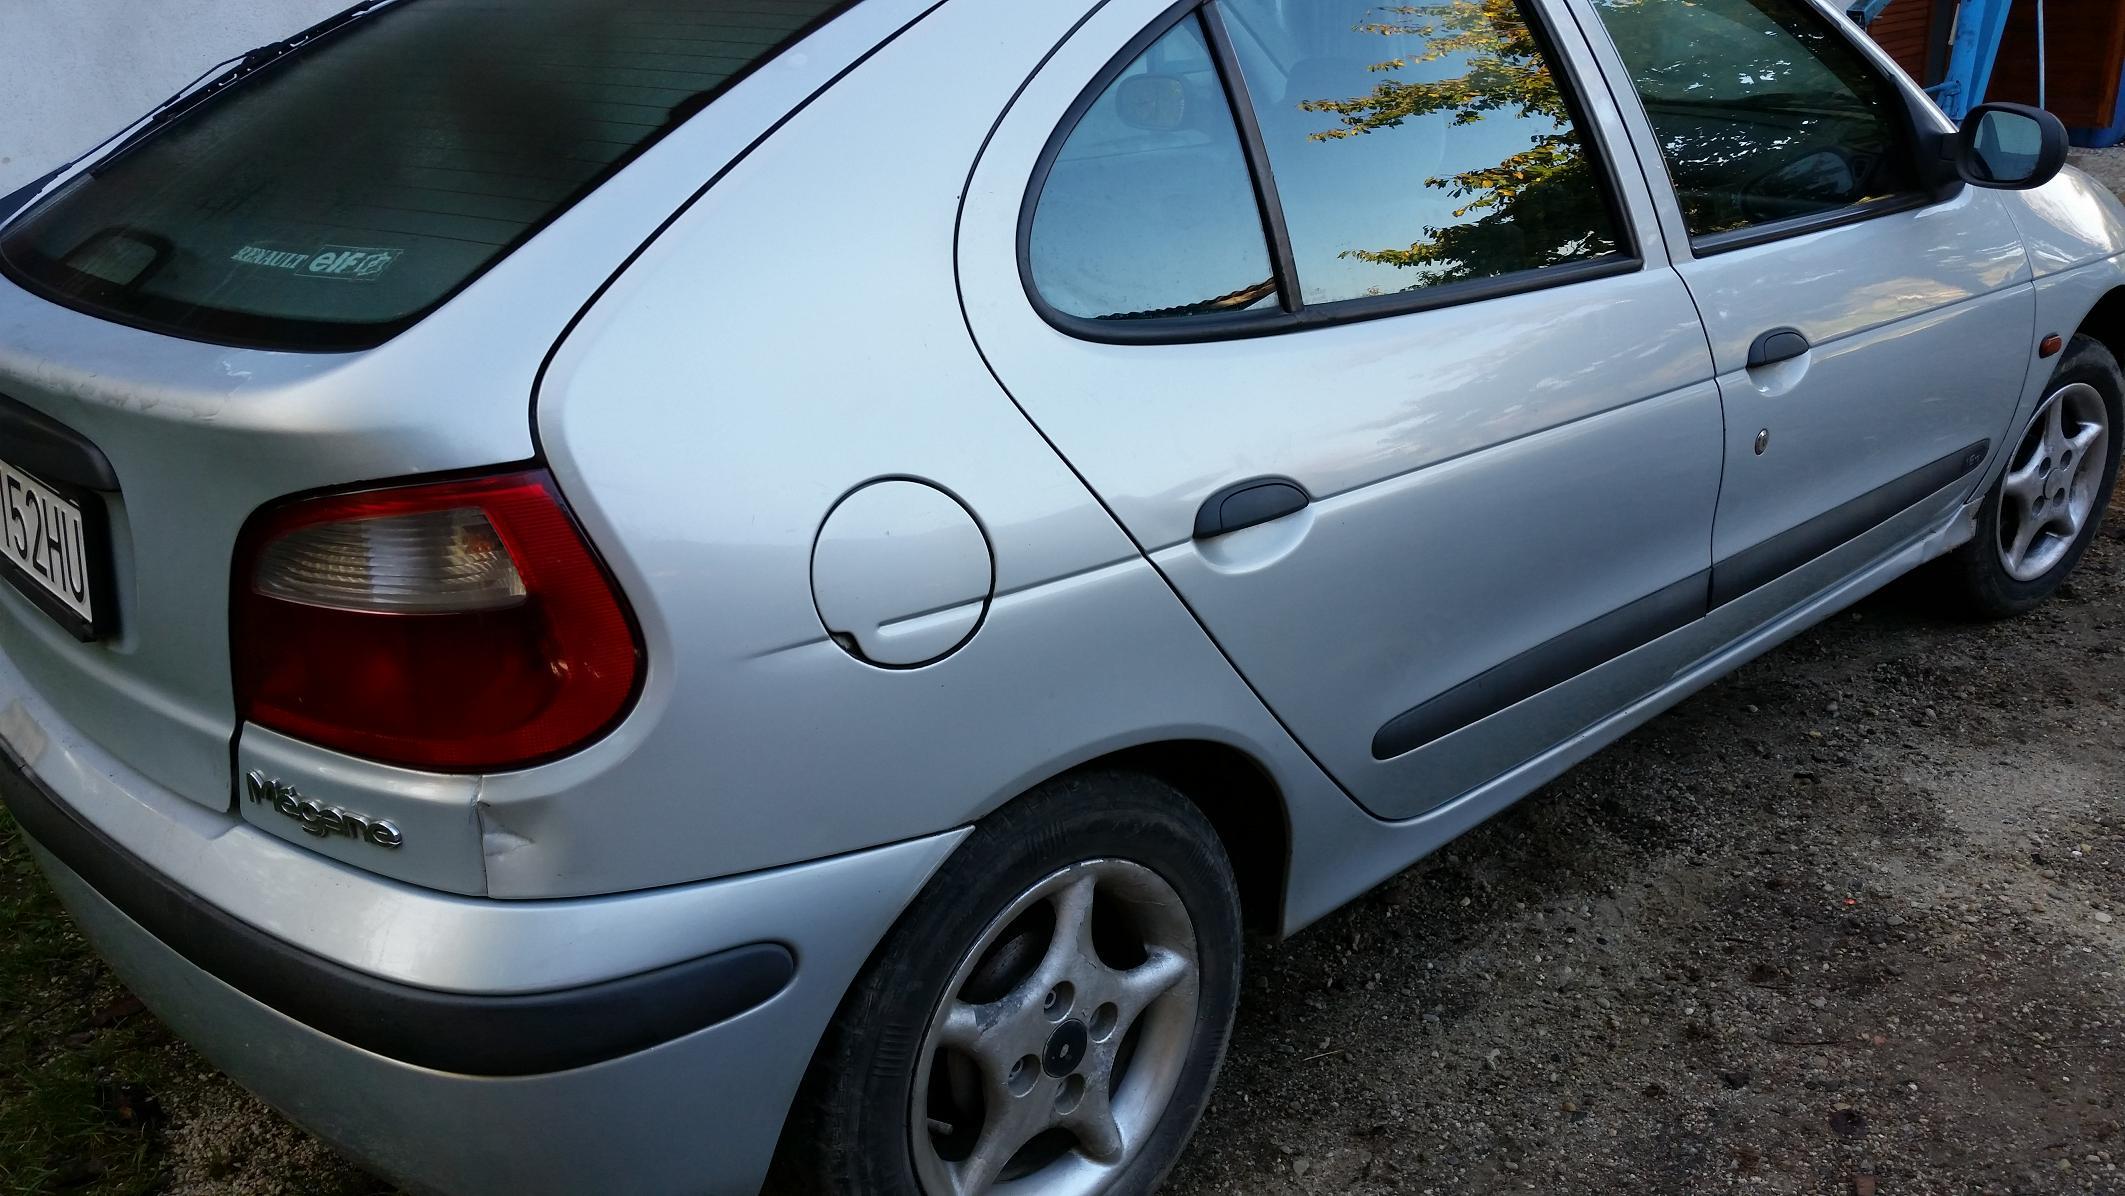 Dezmembrez Renault Megane 1, 1.9 diesel, 47 kw, caroserie